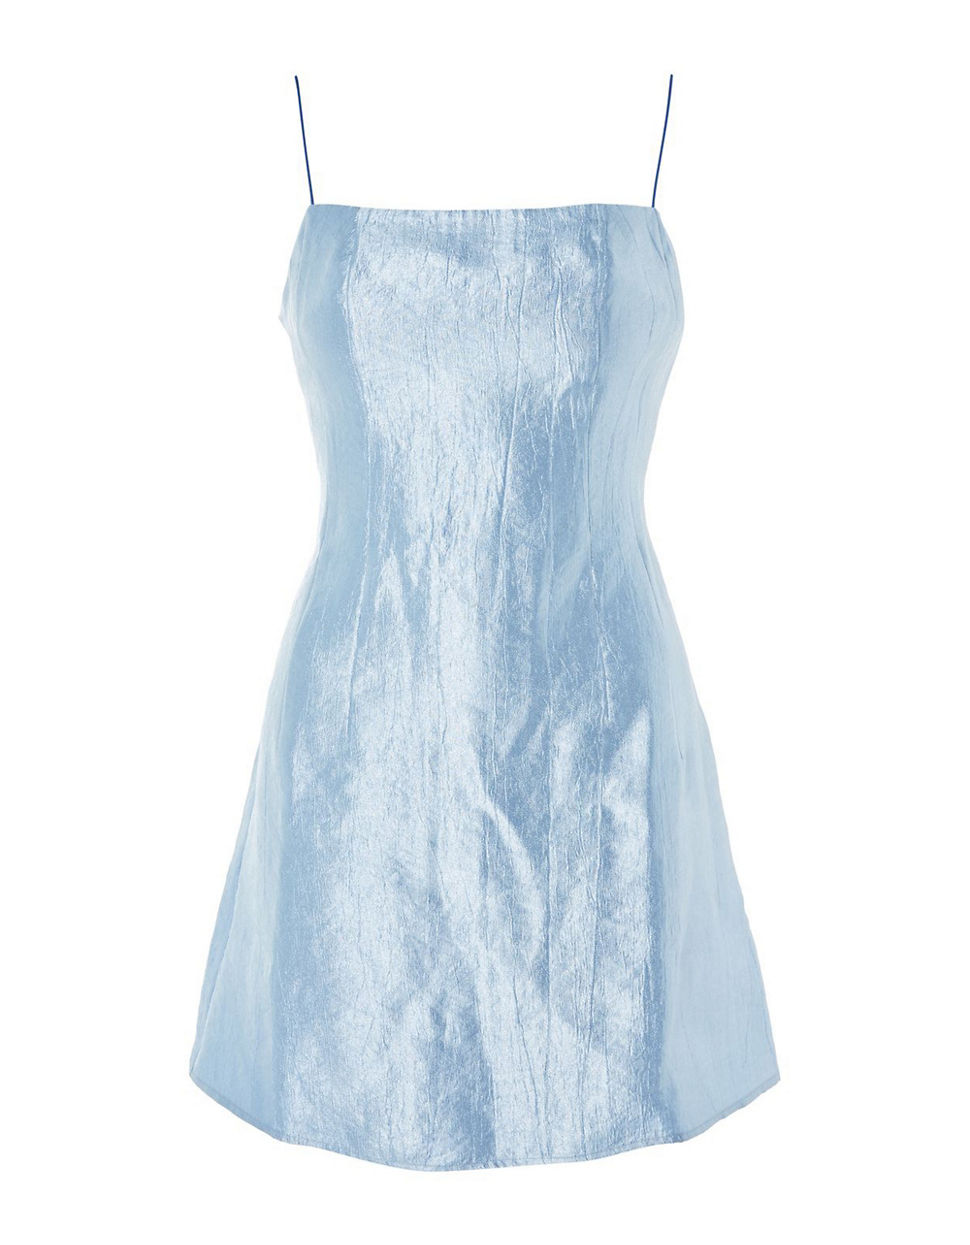 TOPSHOP | Dresses | Women | Hudson\'s Bay